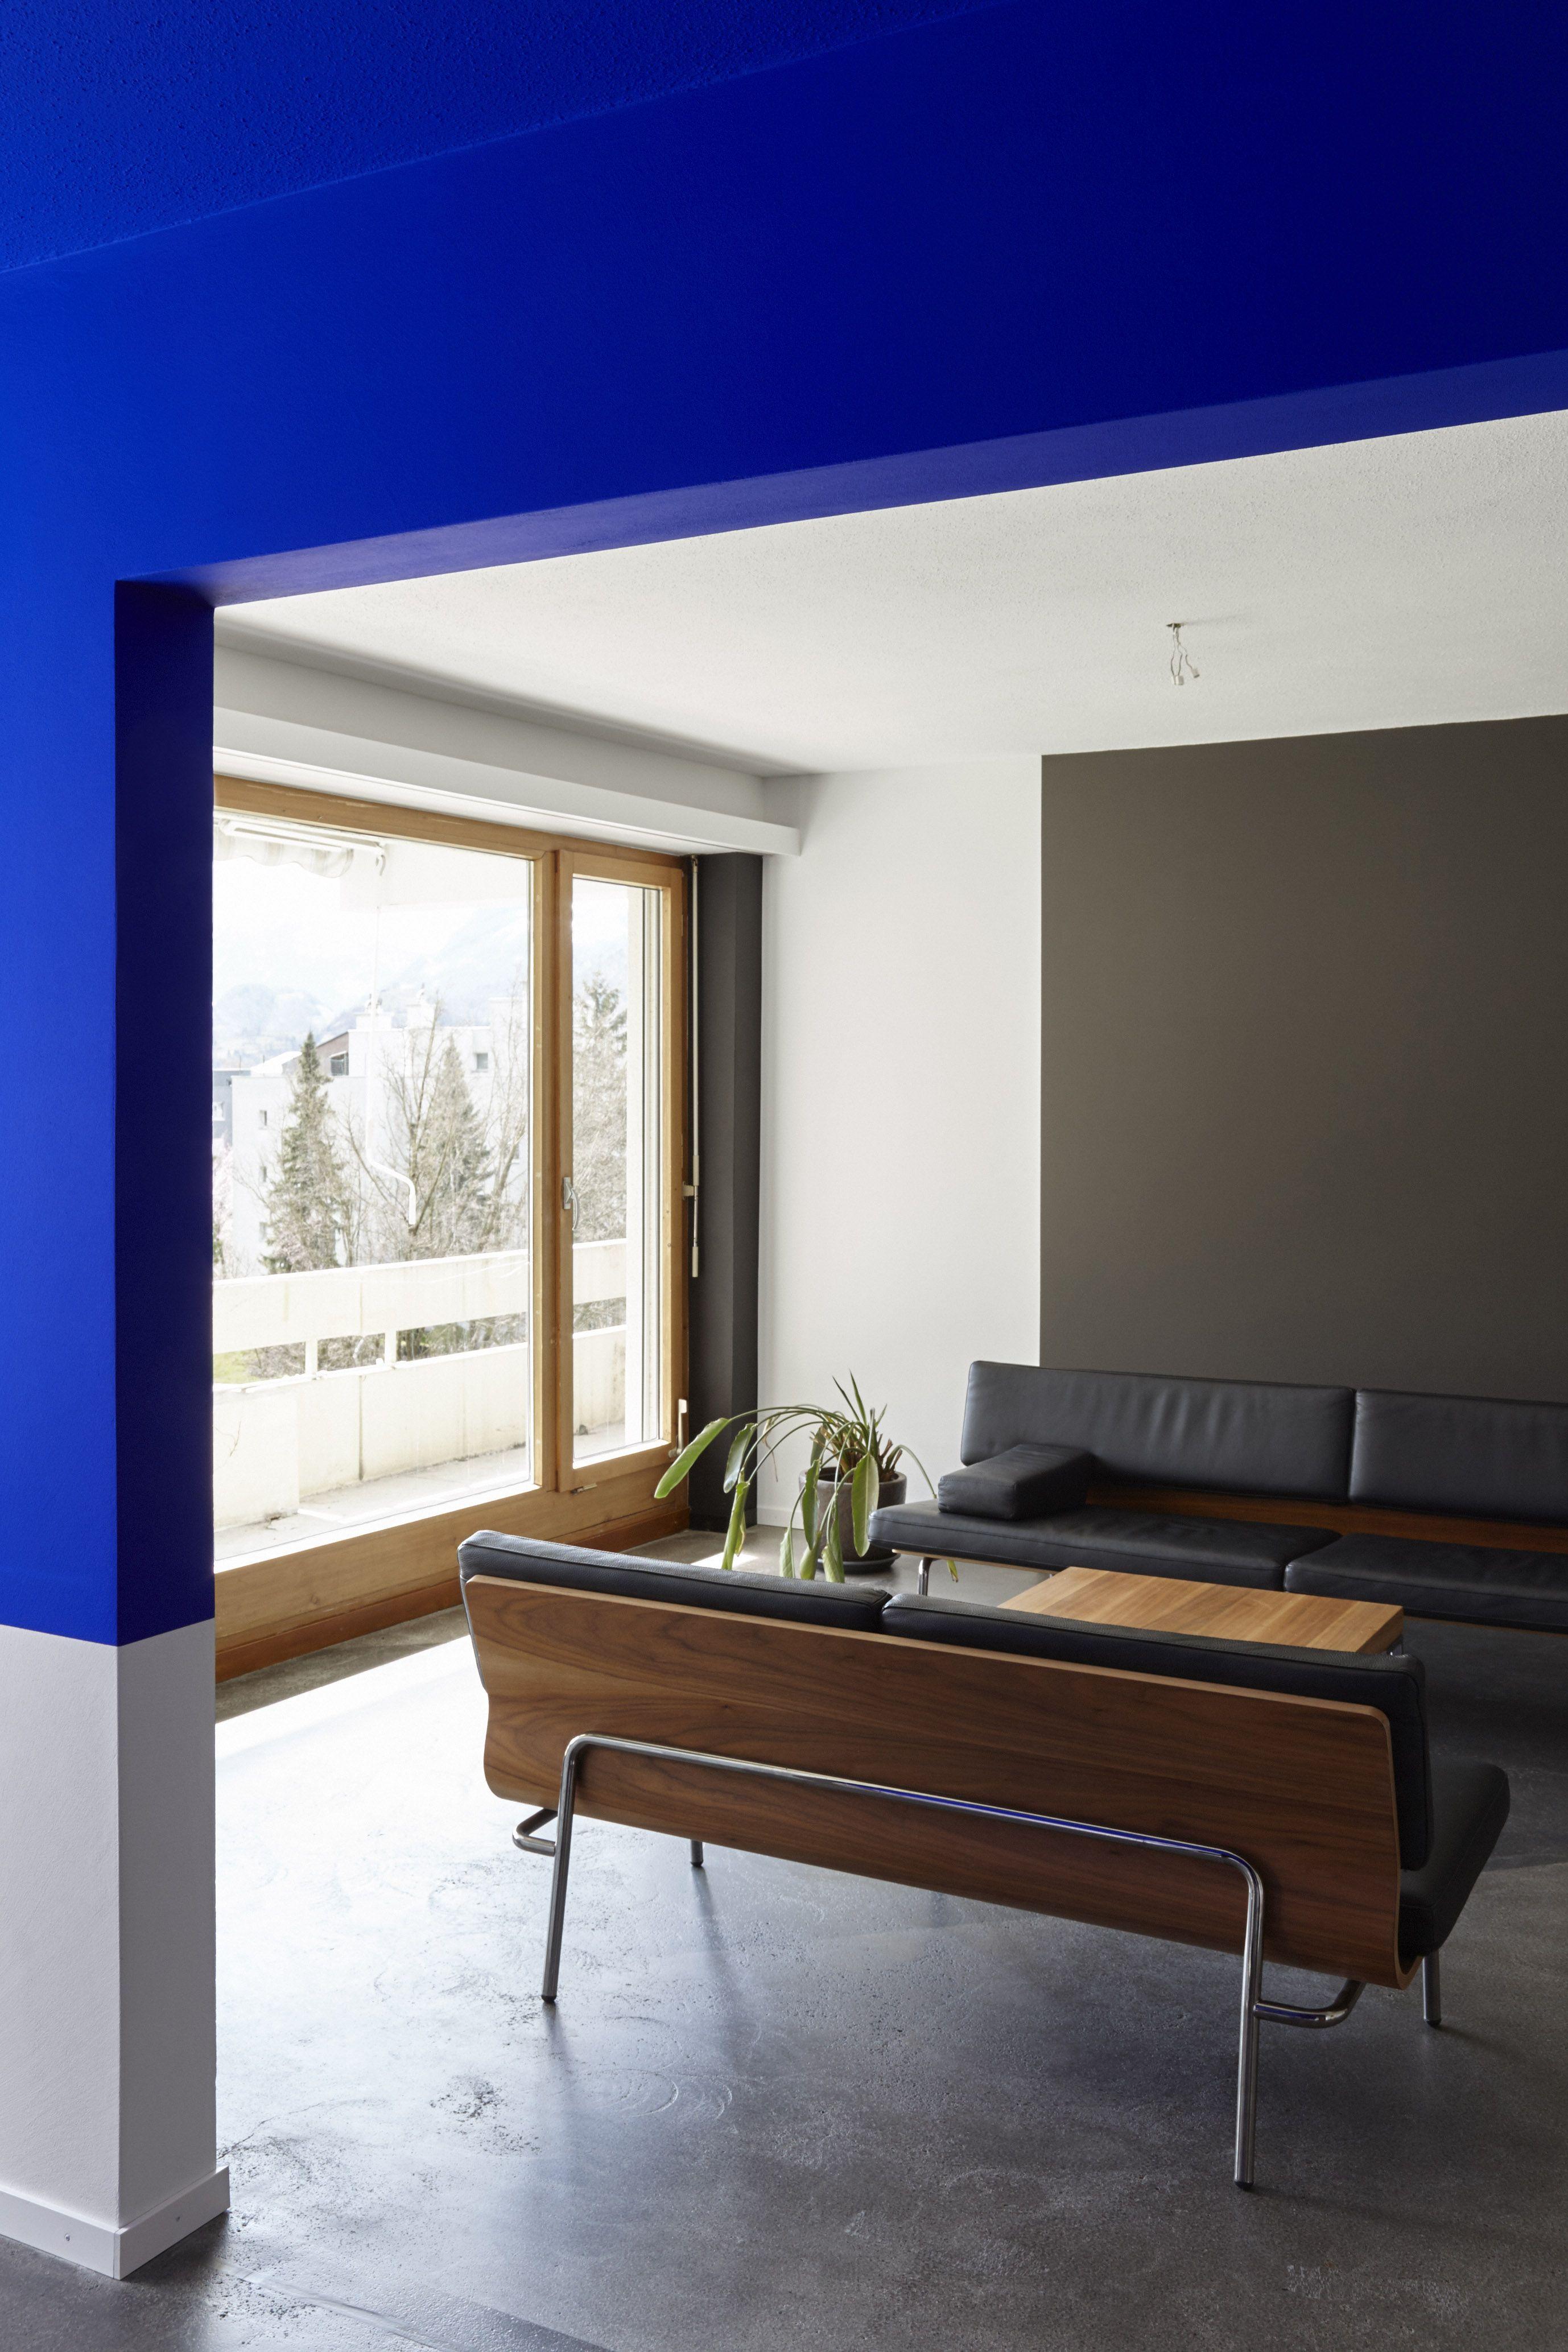 Schwefel Blue Interior Design Blue Room Paint African Decor Living Room Minimalist blue room paint